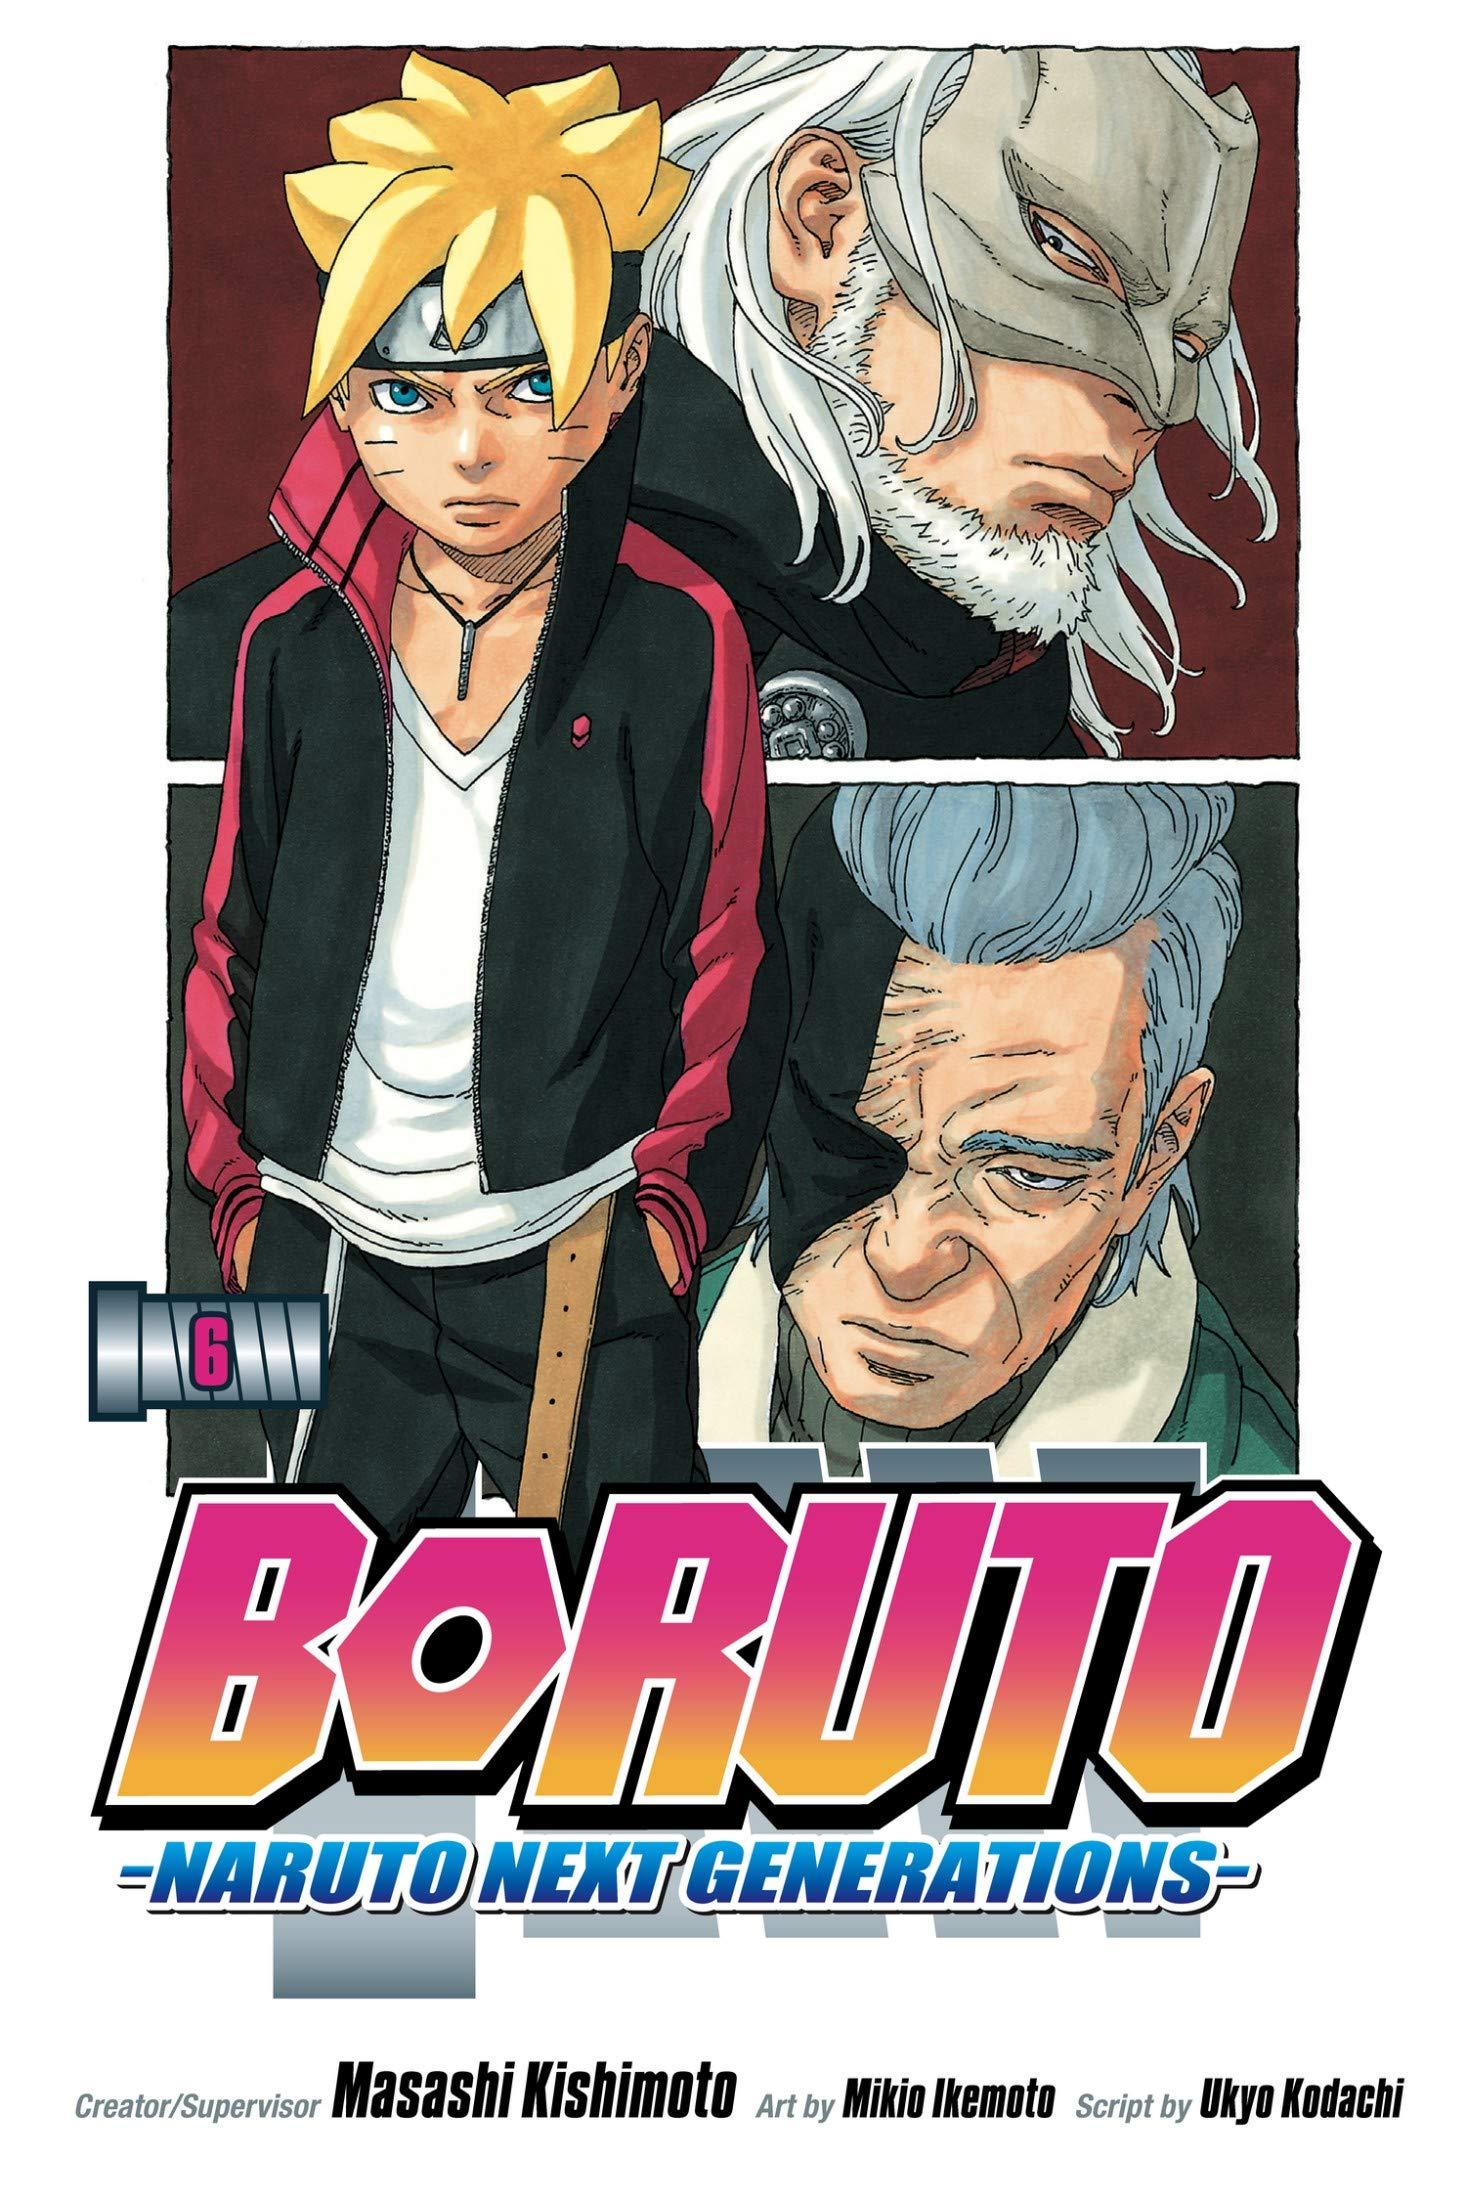 Next Generations: Vol 6 Boruto Naruto Great Shounen Manga For Young & Teens , Adults